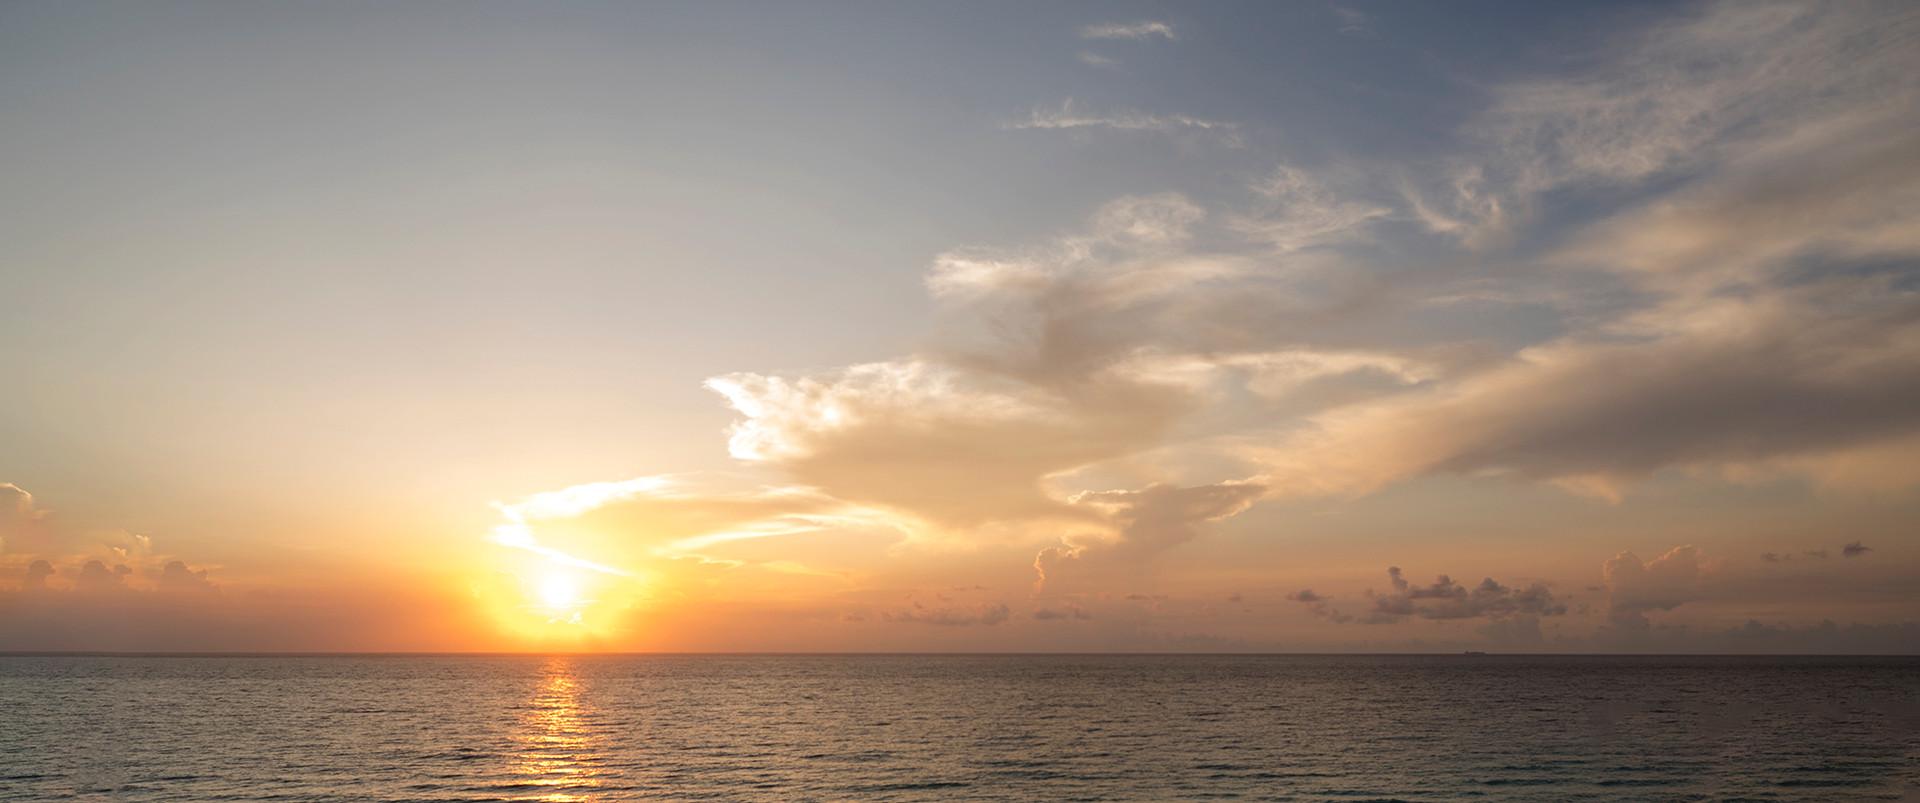 Cancún Sunset